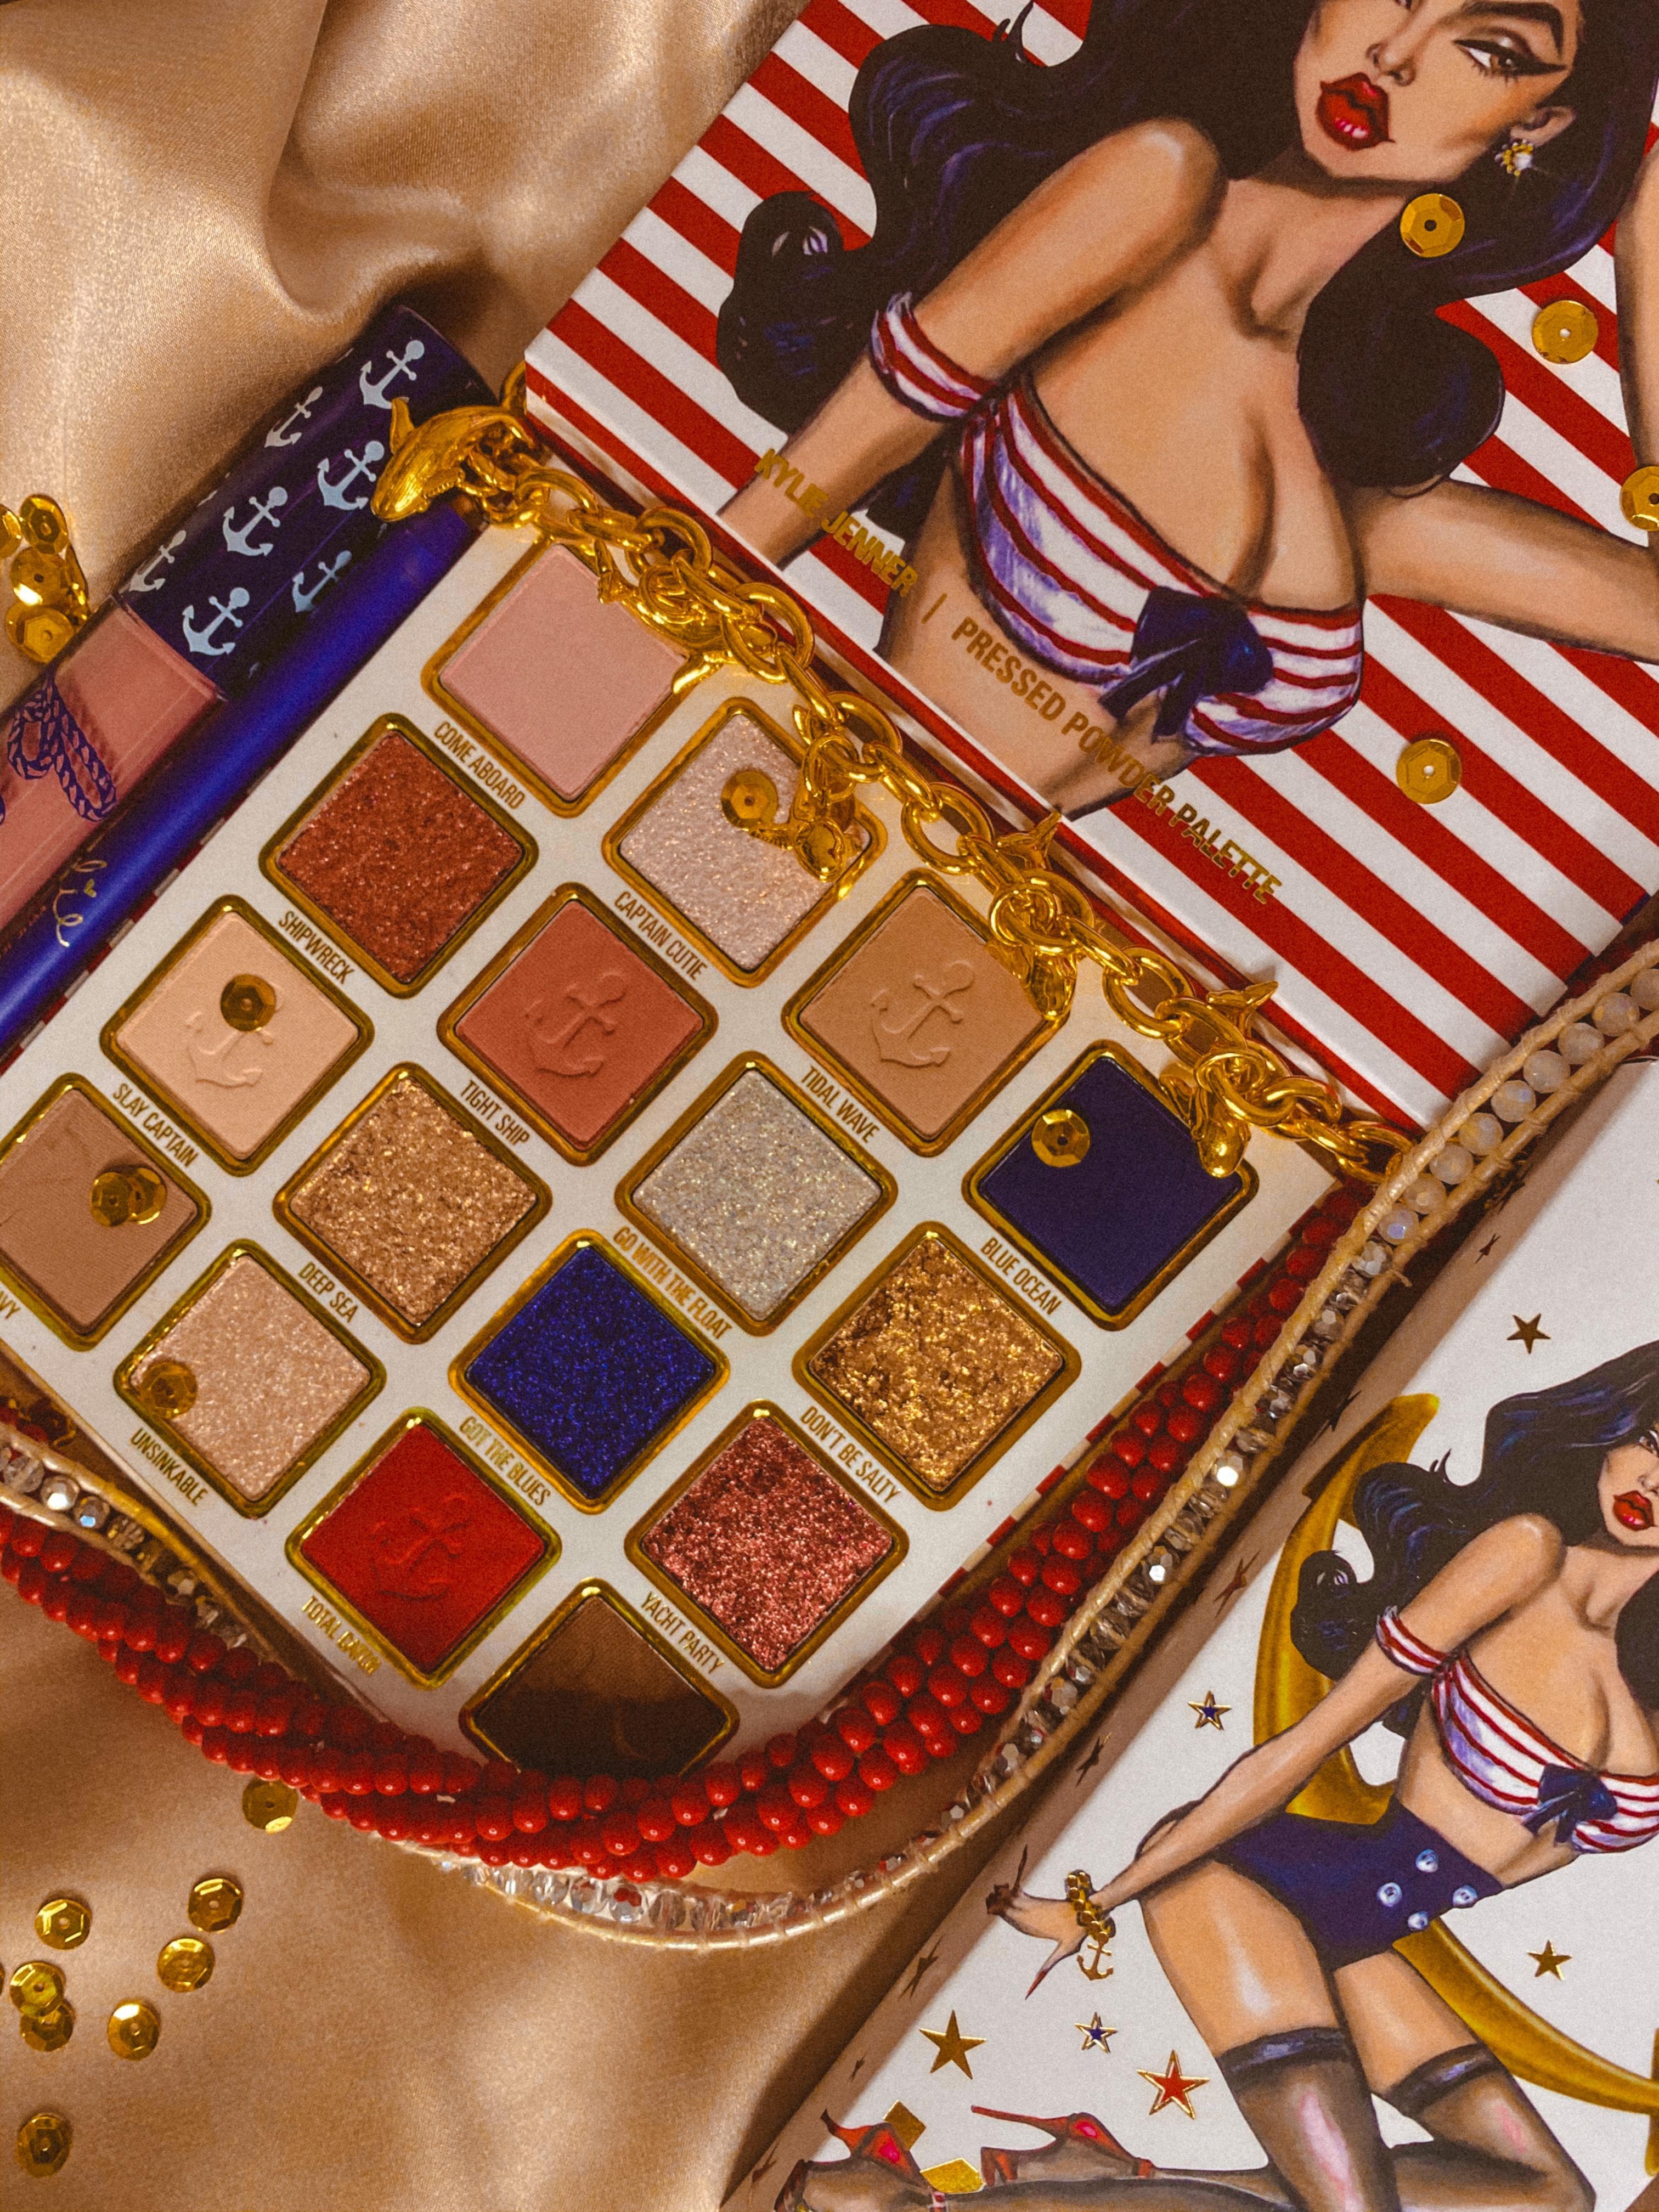 Kylie Cosmetics Sailor Pressed Powder Palette